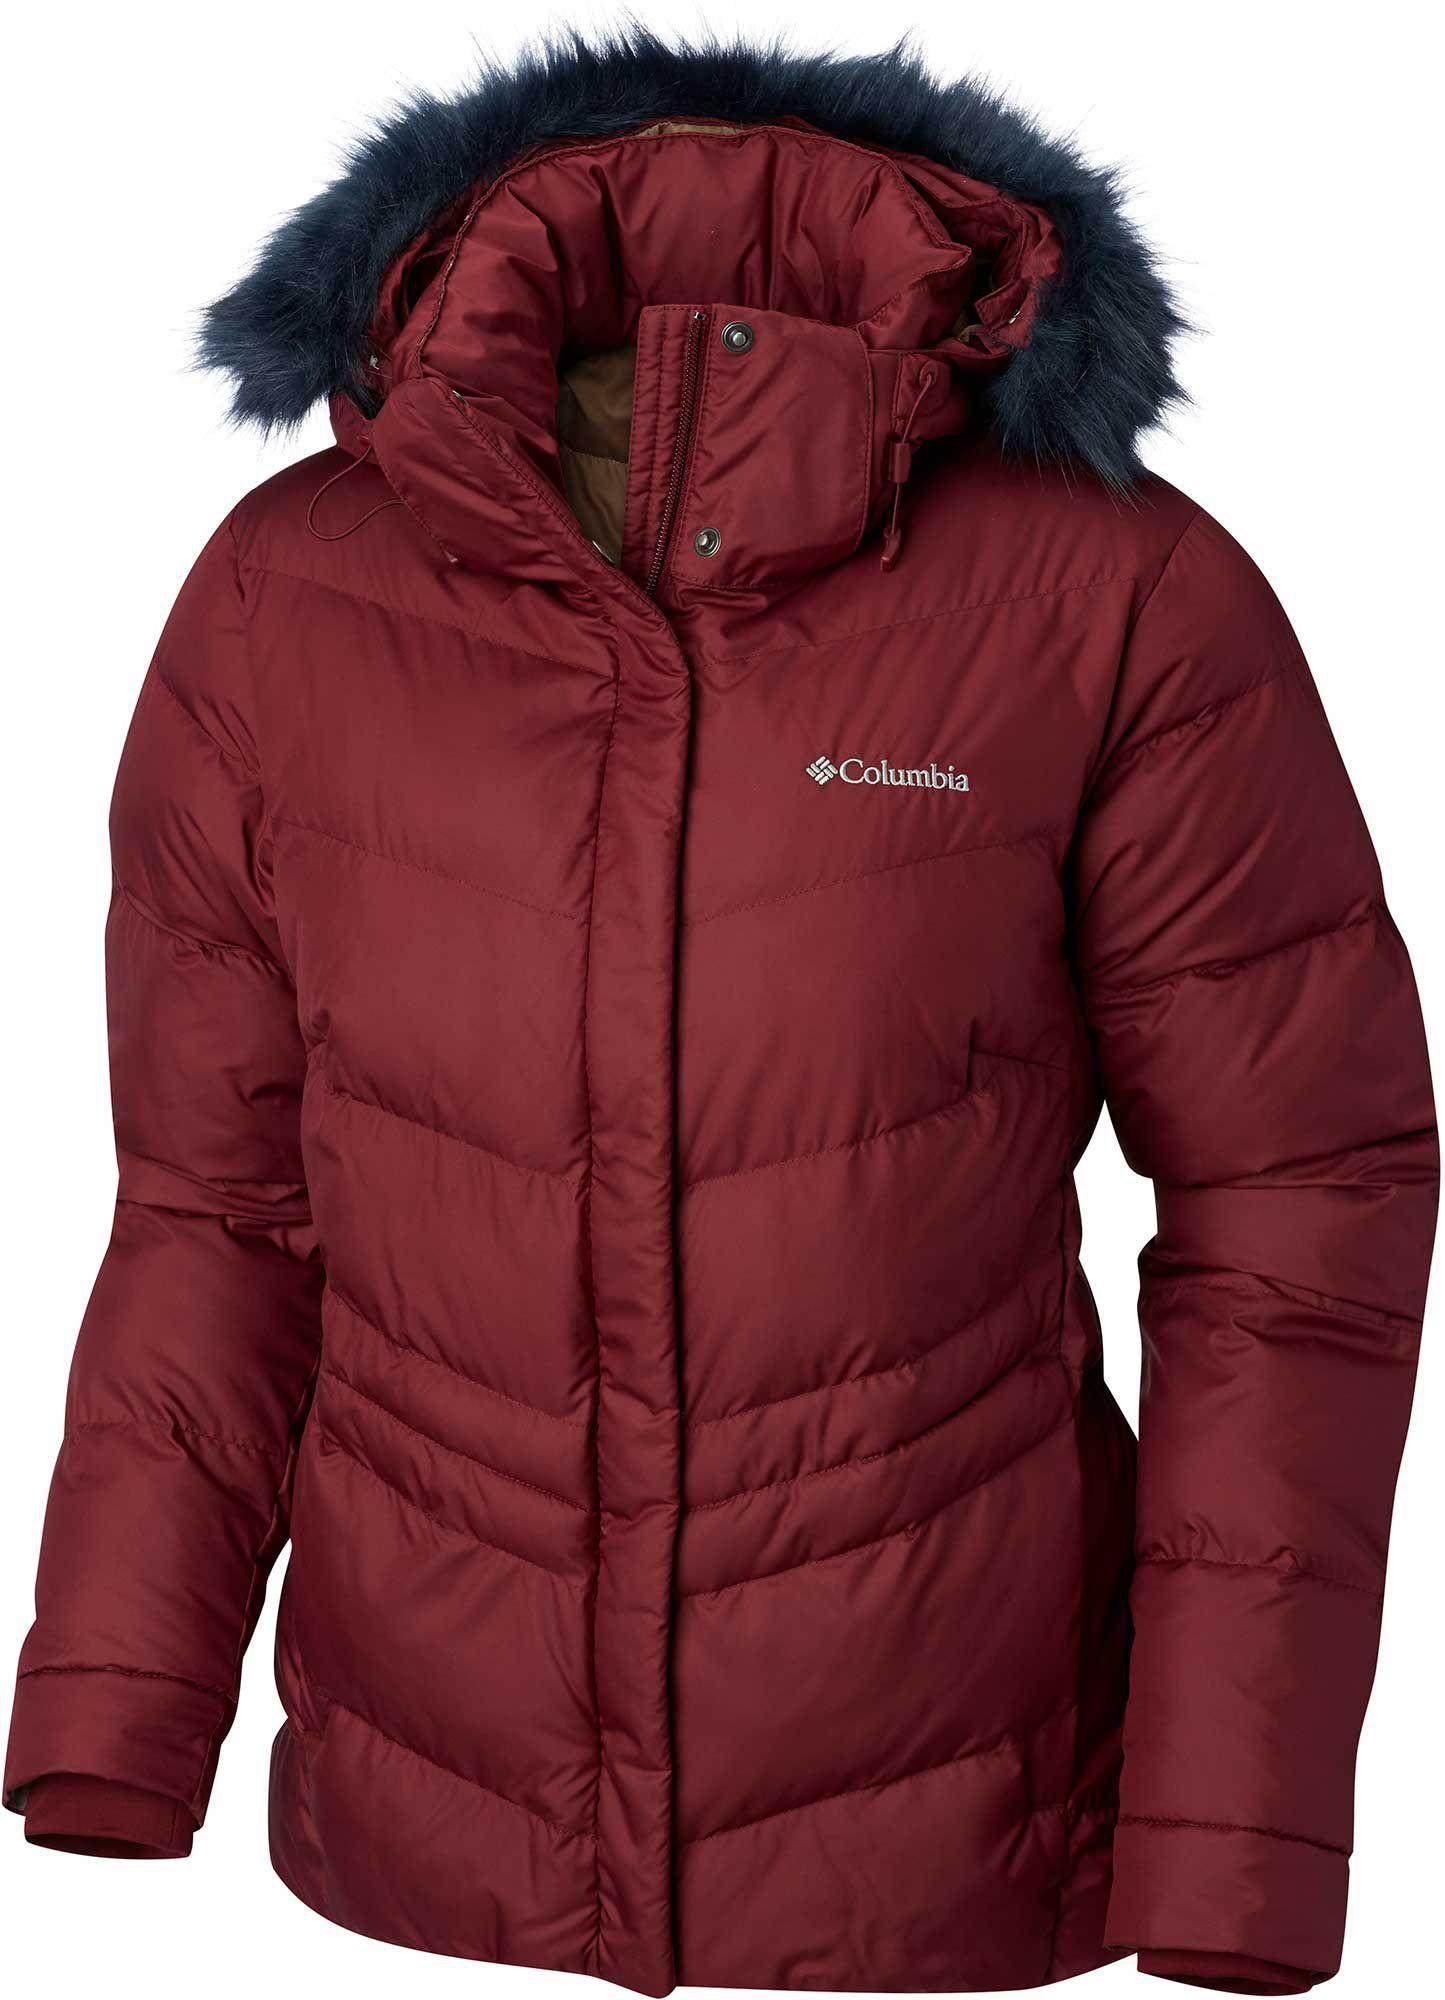 0e3f5be53f5 Columbia Women's Peak to Park Insulated Jacket. Columbia Women's Peak to  Park Insulated Jacket Columbia Sportswear, Down Coat, Outdoor ...